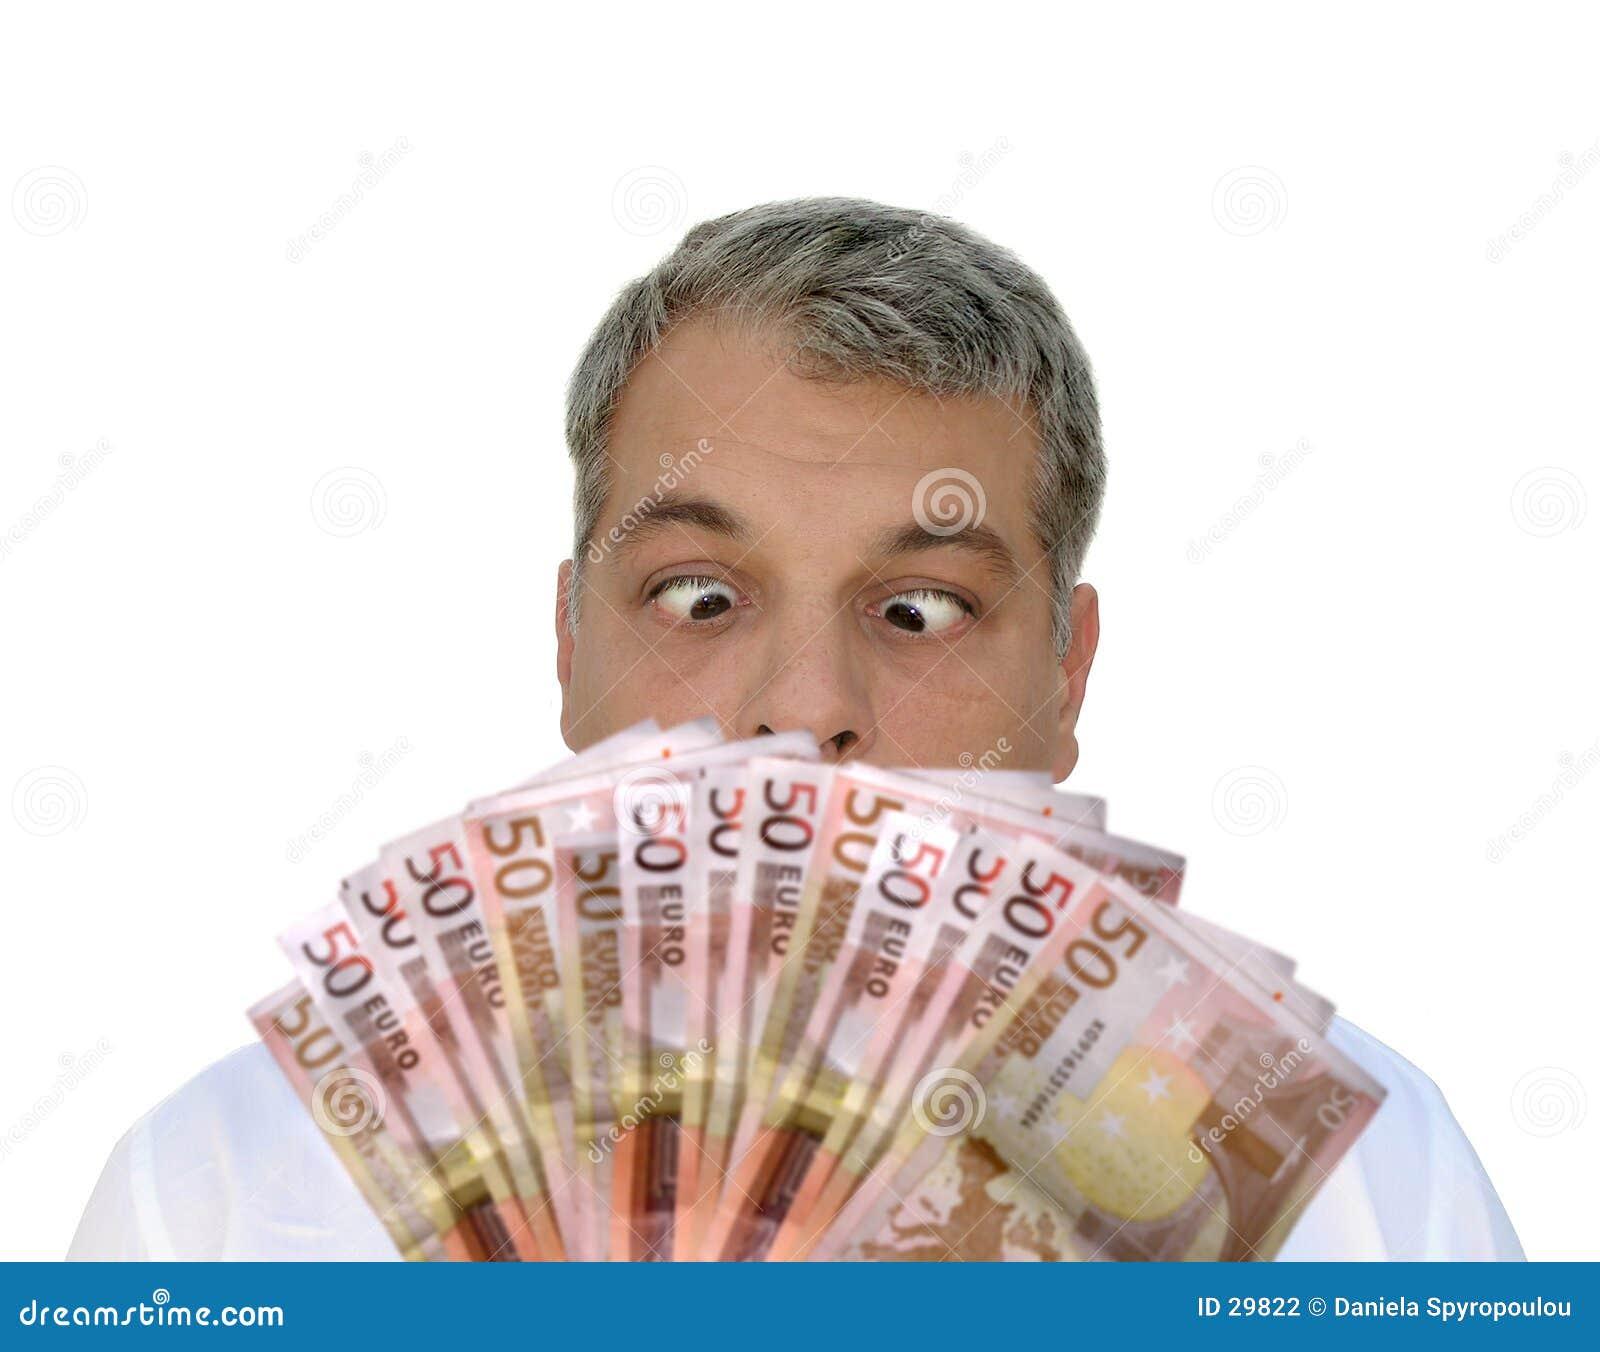 I want that money!!